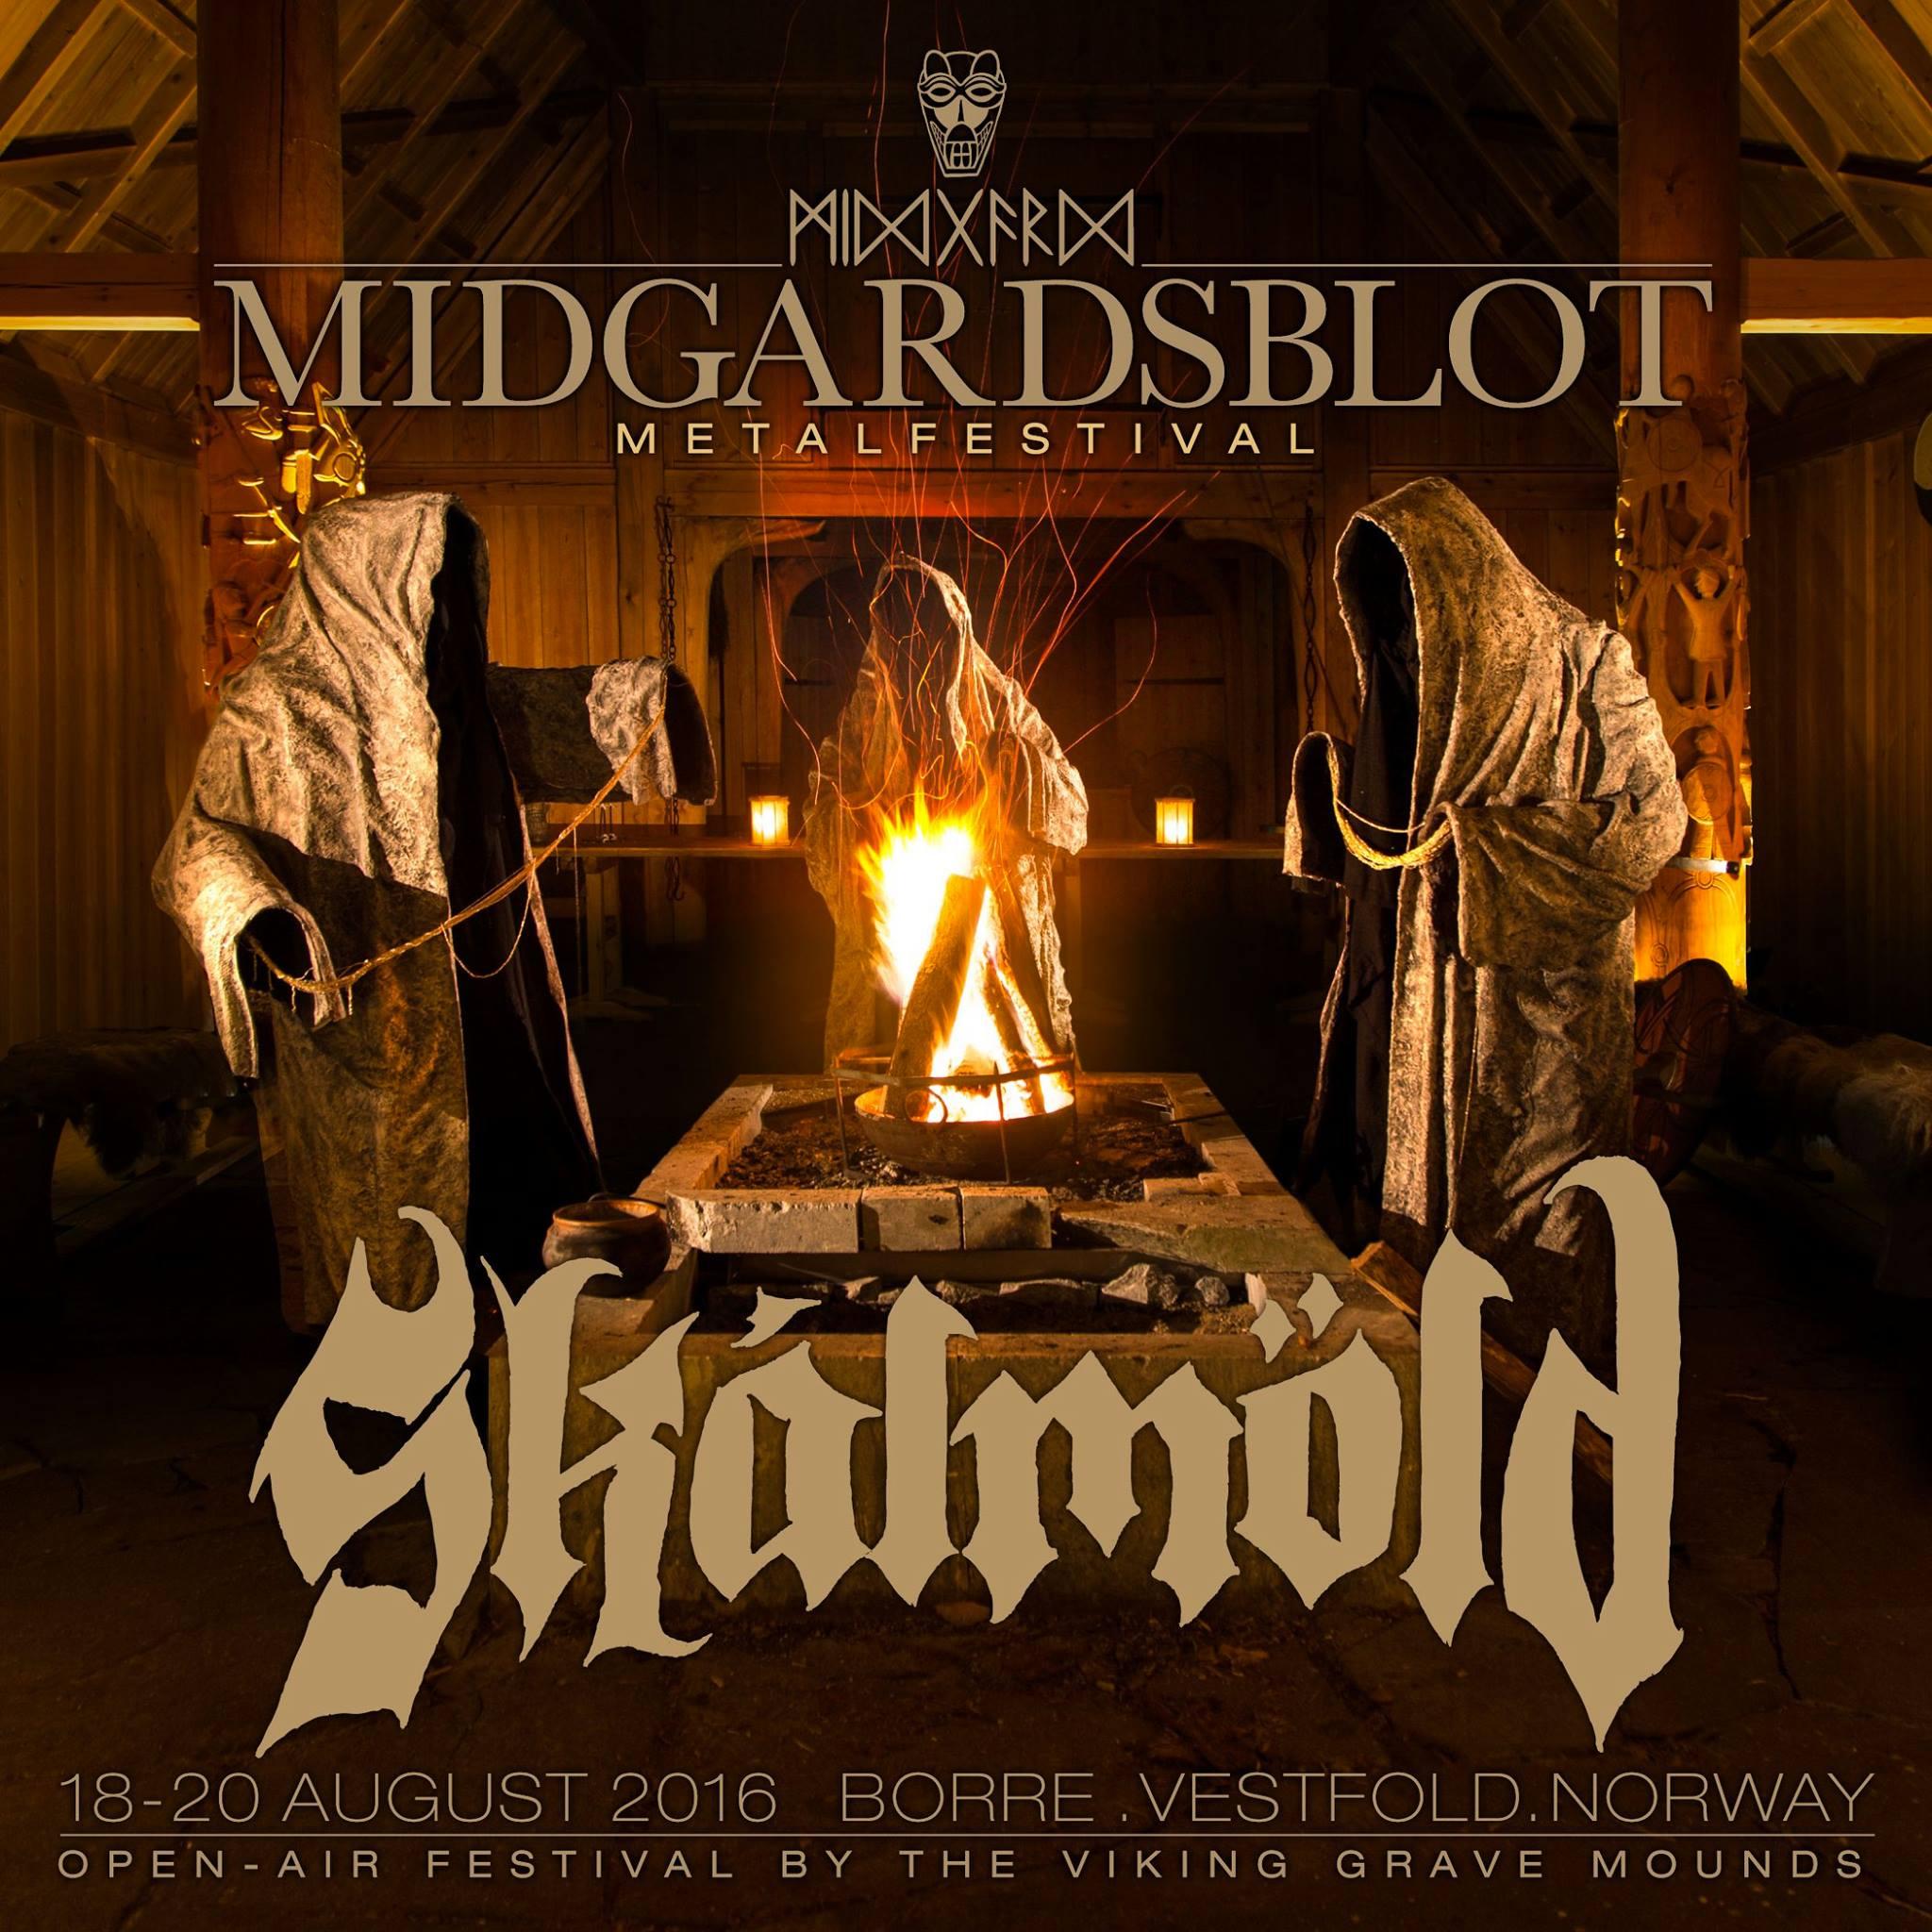 Midgardsblot Metal Festival 2016